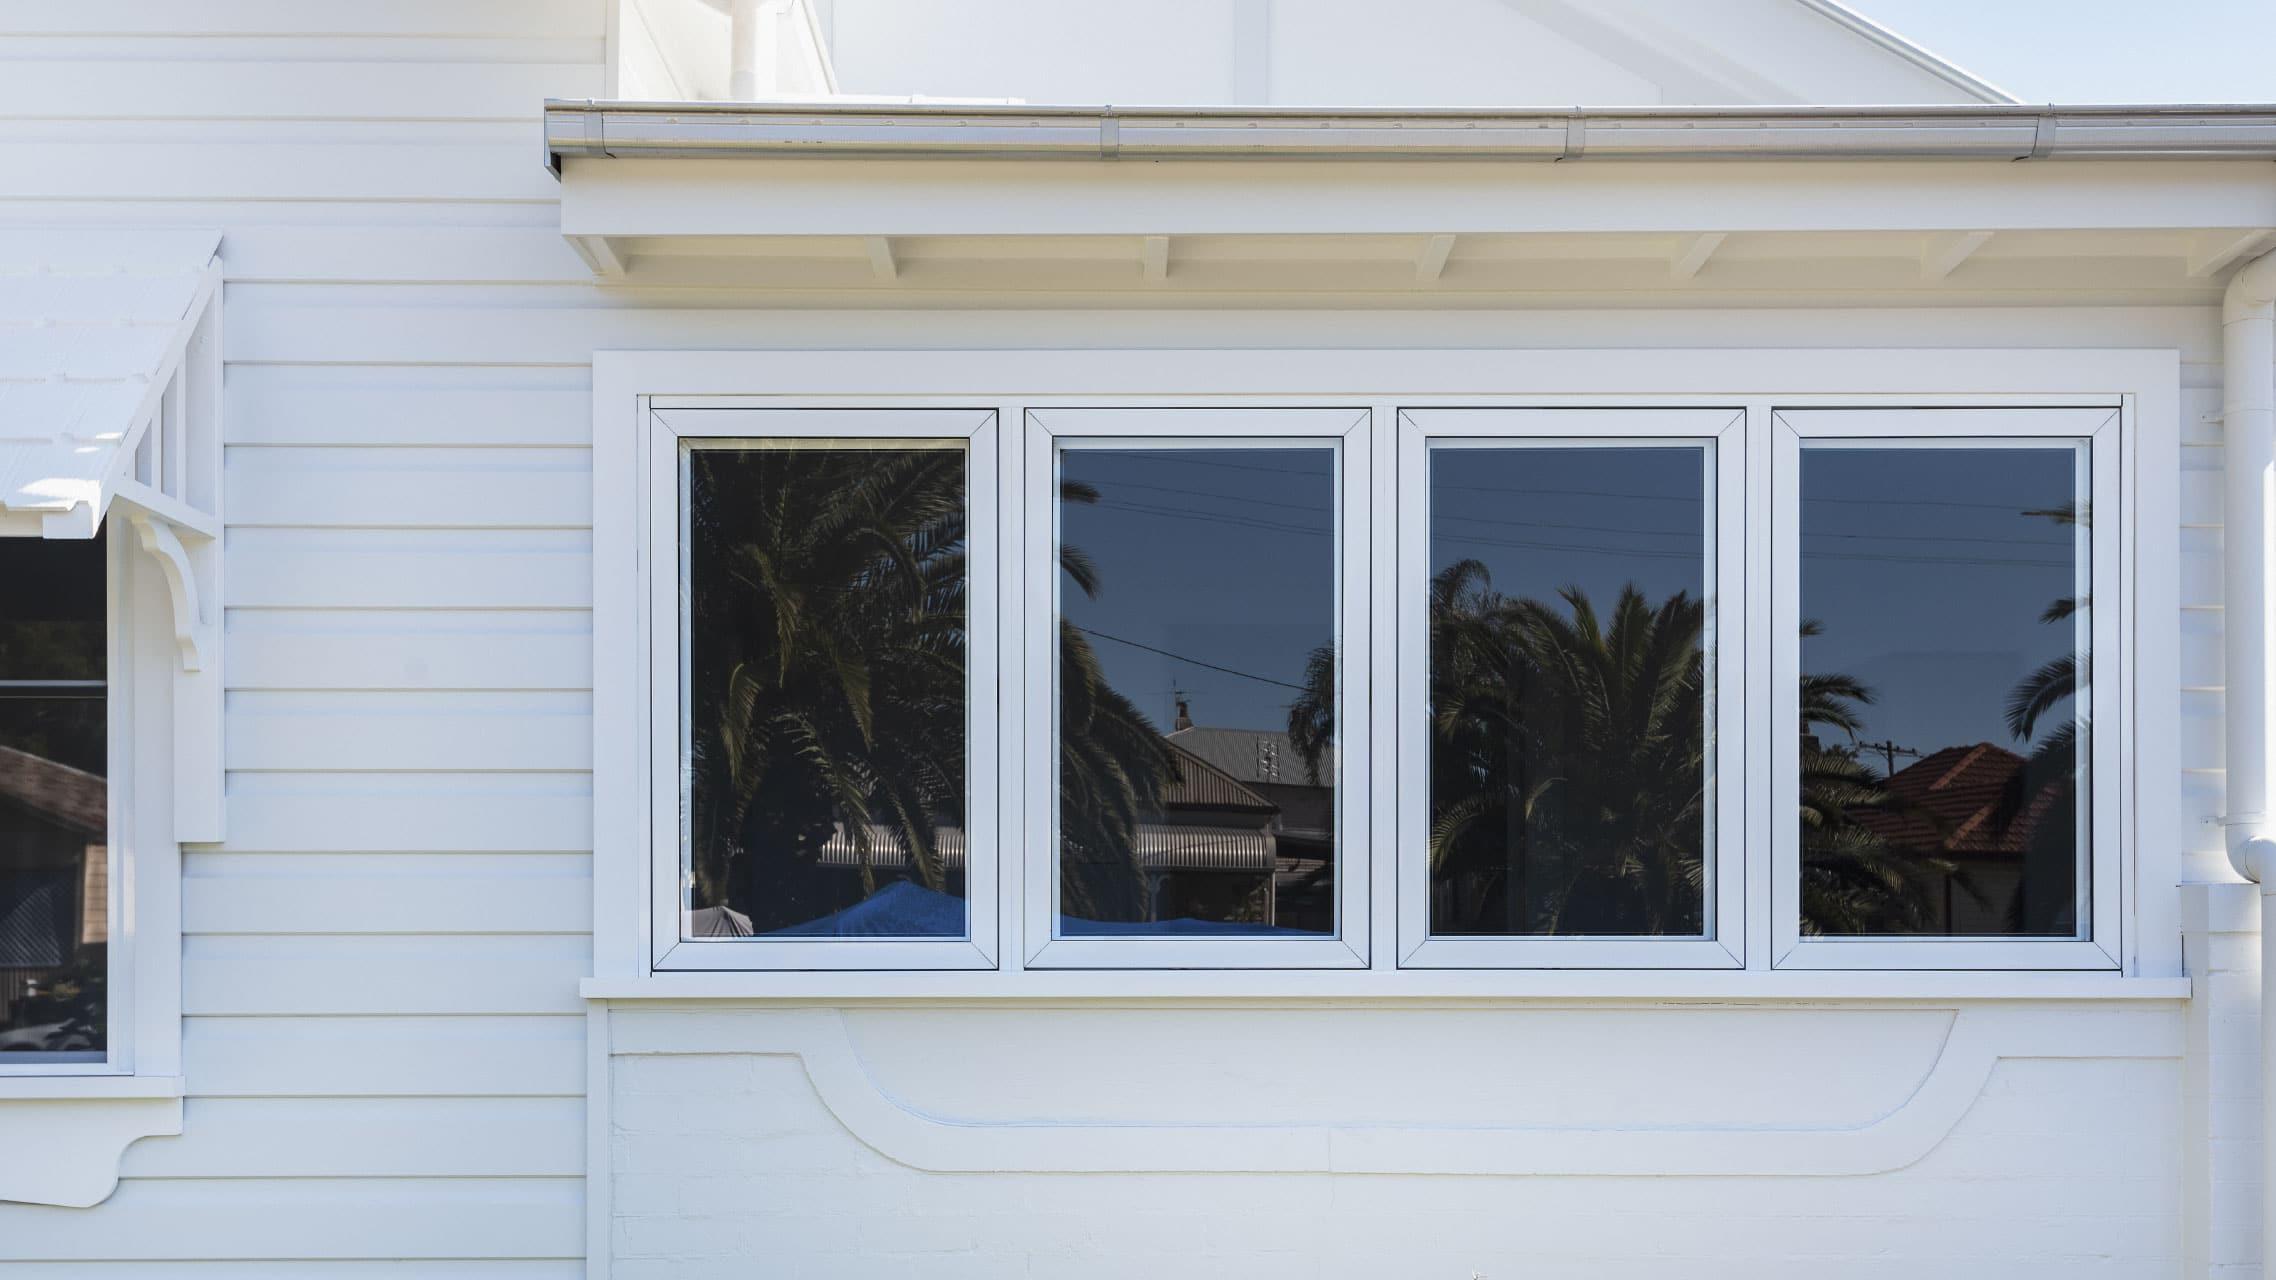 White Casement Windows closed